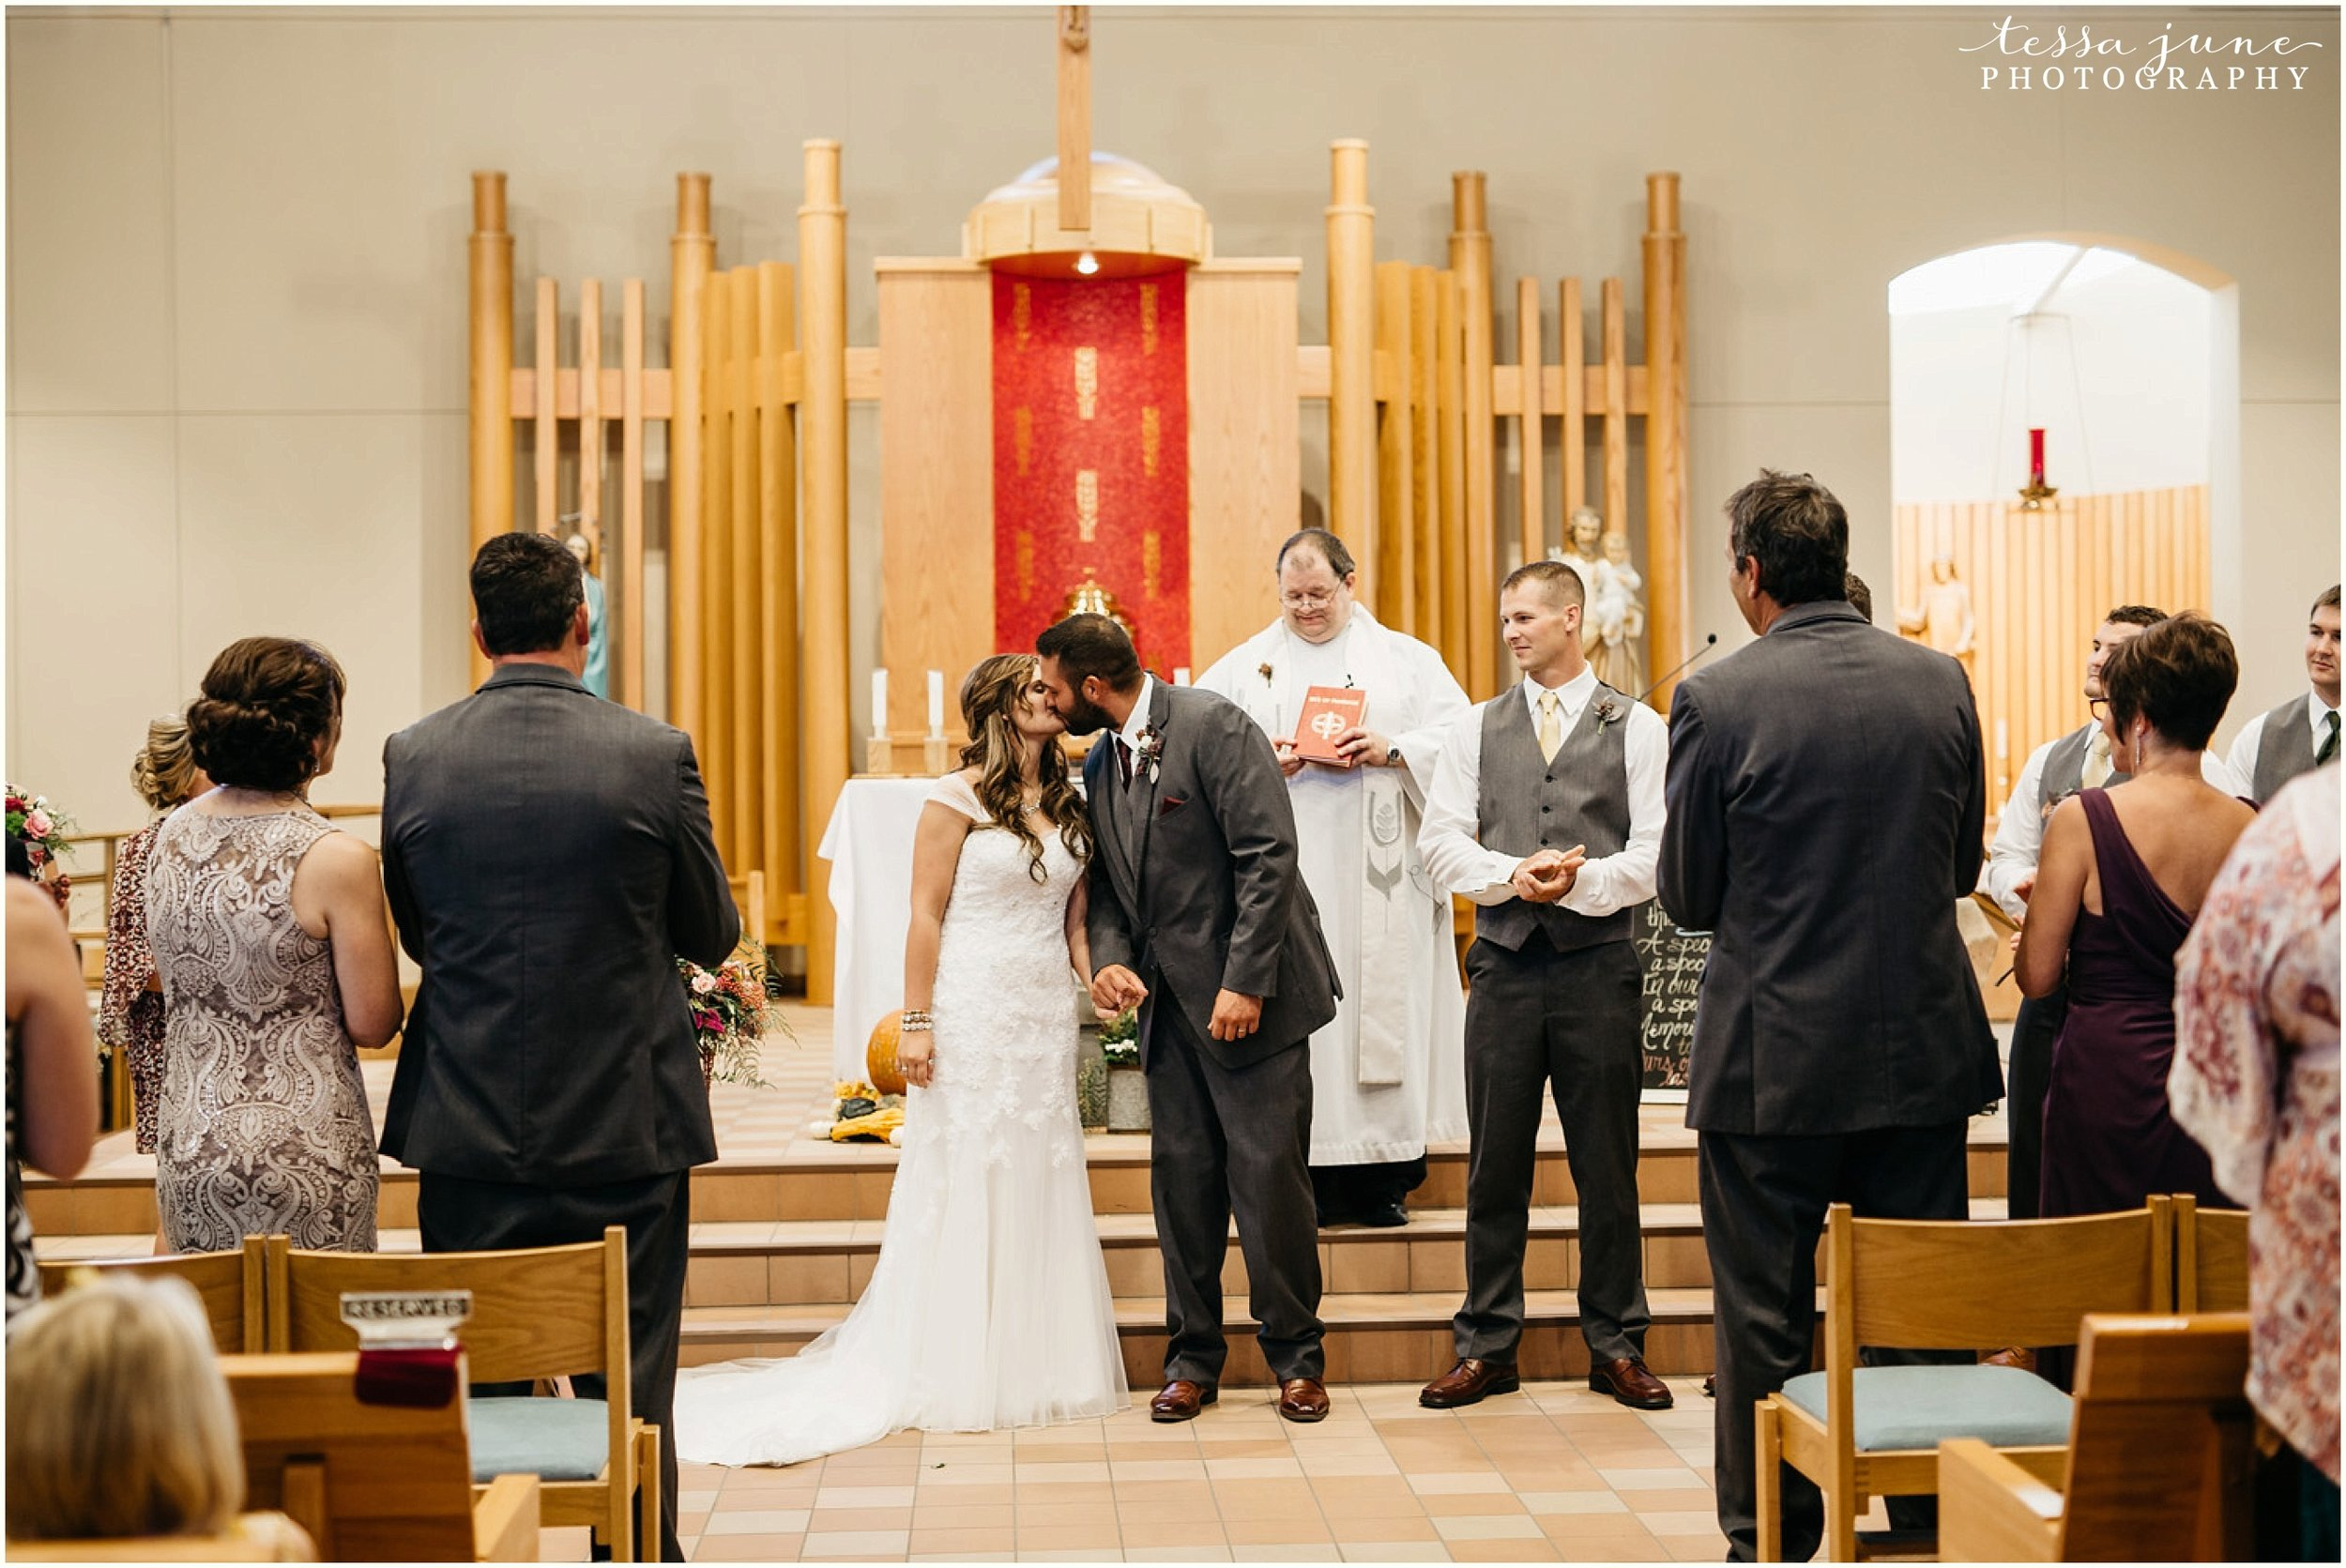 bohemian-minnesota-wedding-mismatched-bridesmaid-dresses-waterfall-st-cloud-tessa-june-photography-116.jpg